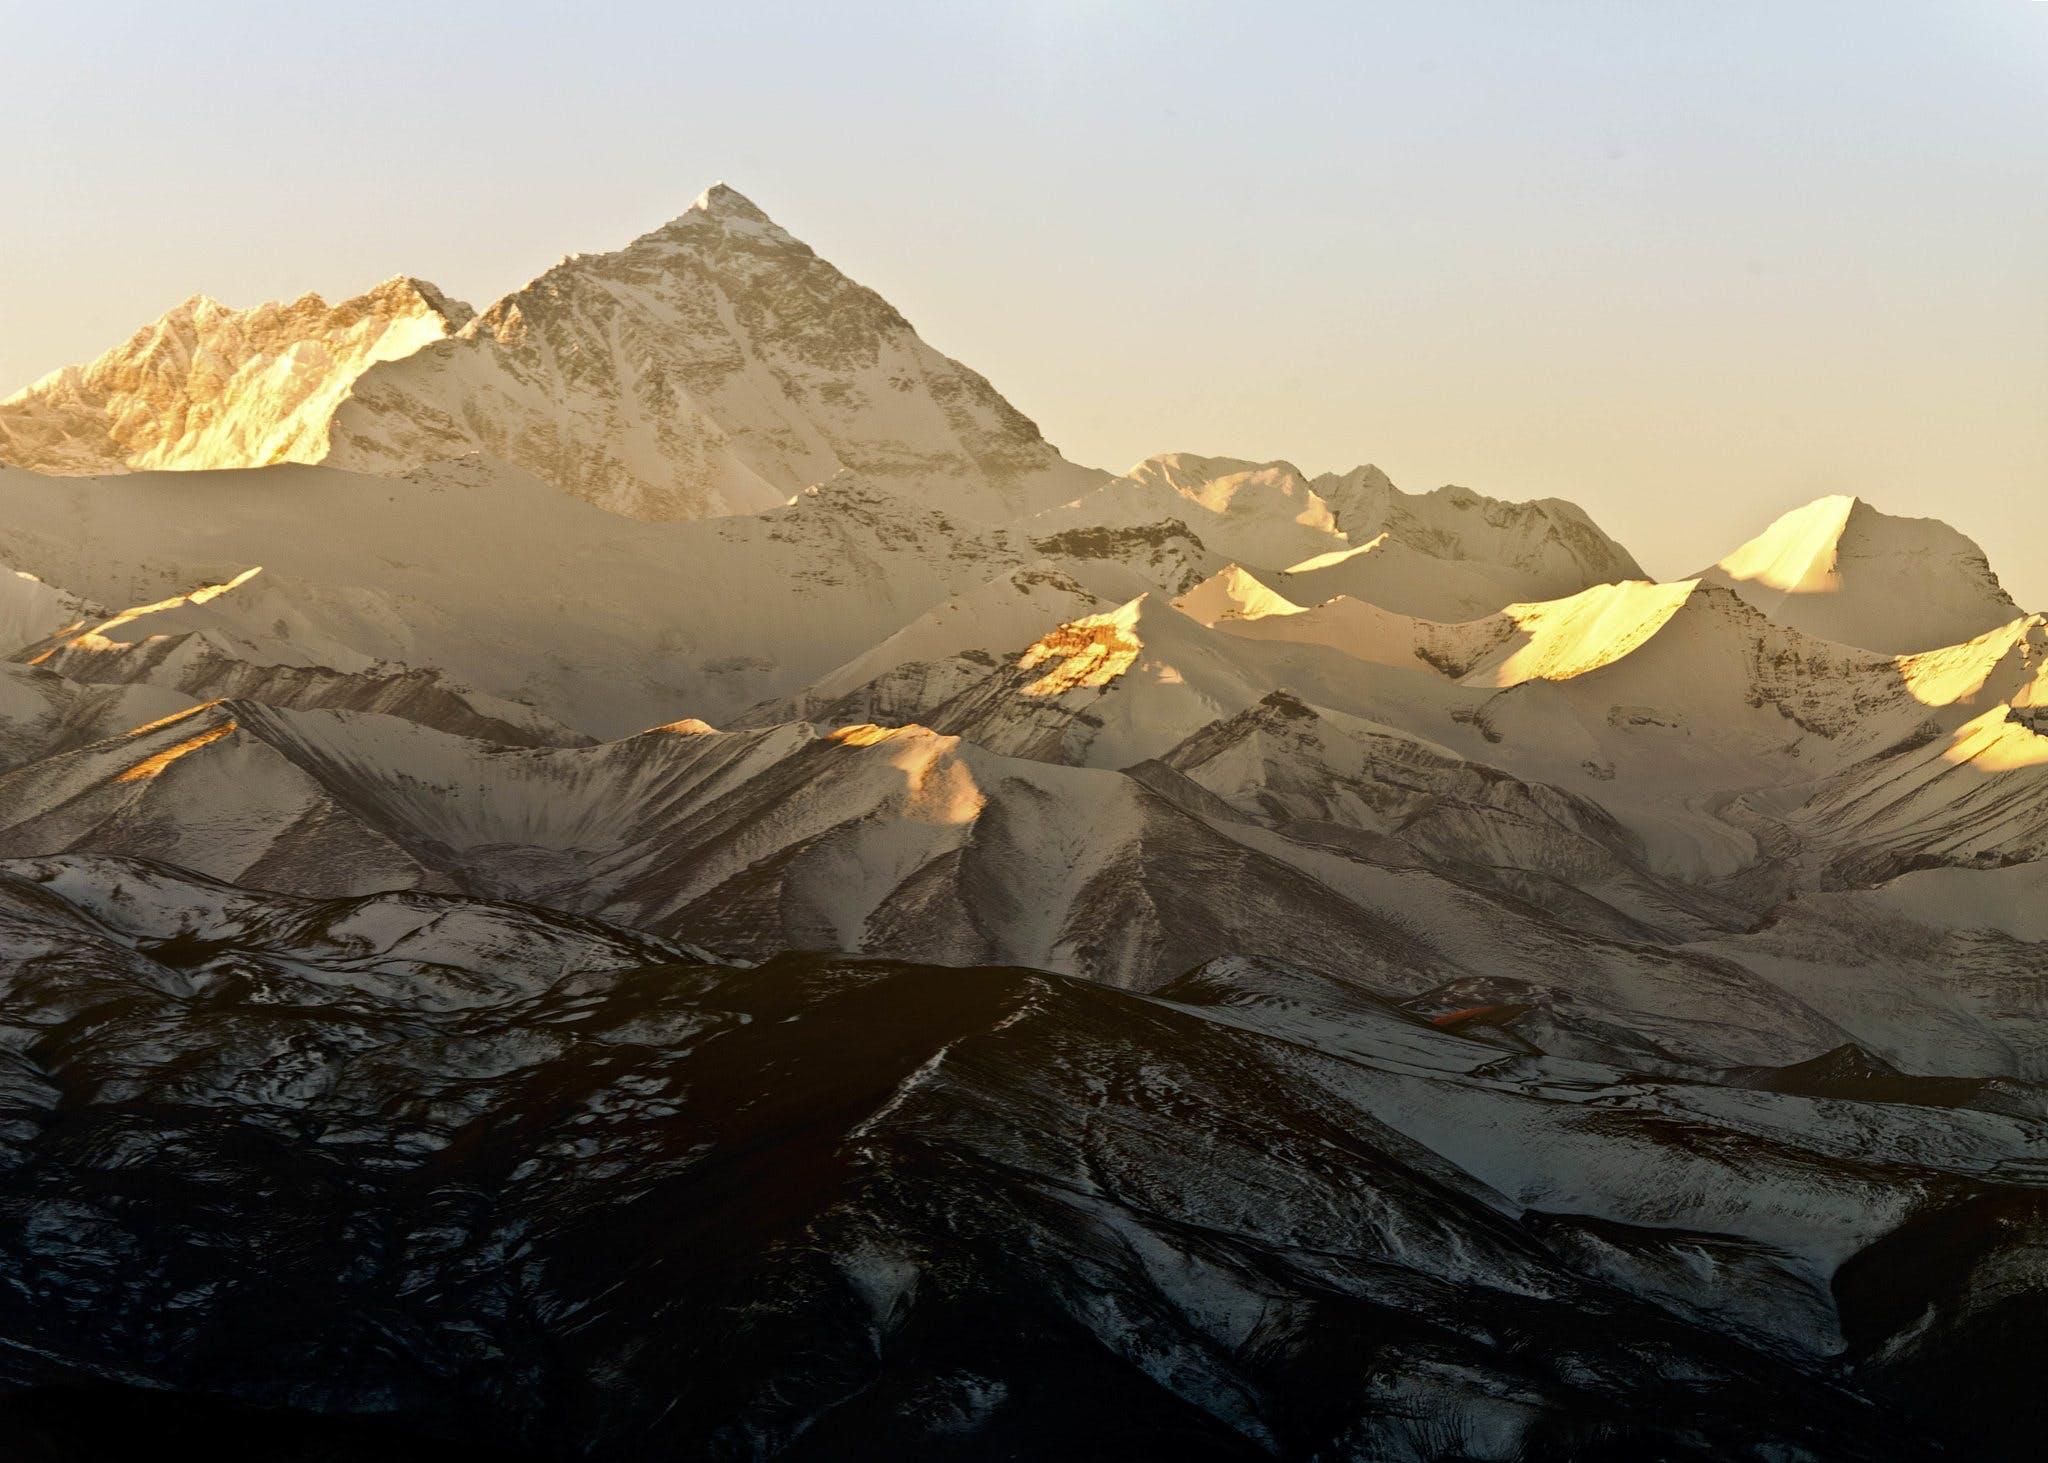 Bestig Mount Everest